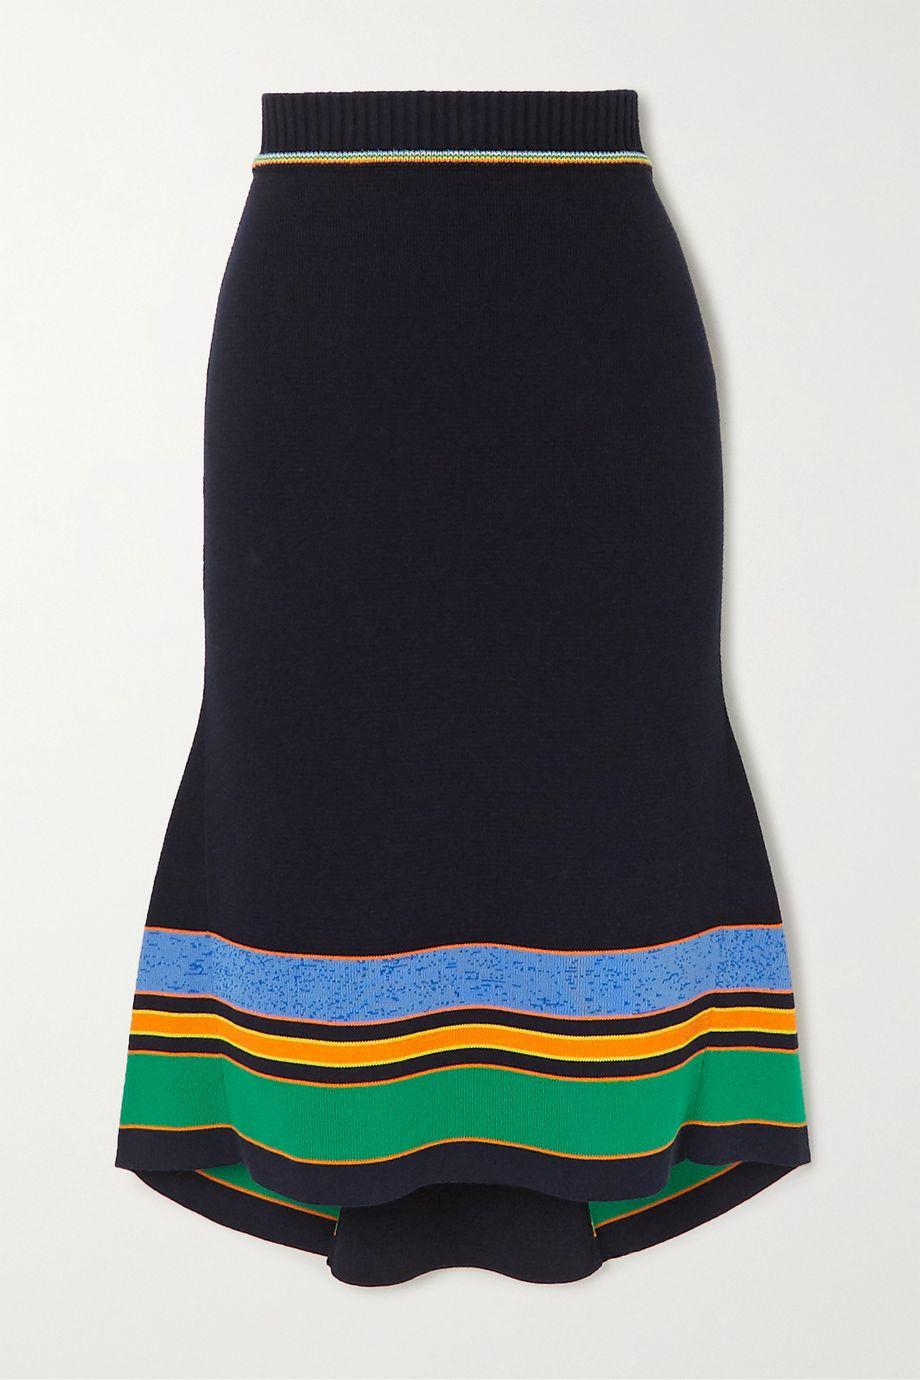 Victoria Beckham Striped ribbed cotton-blend midi skirt